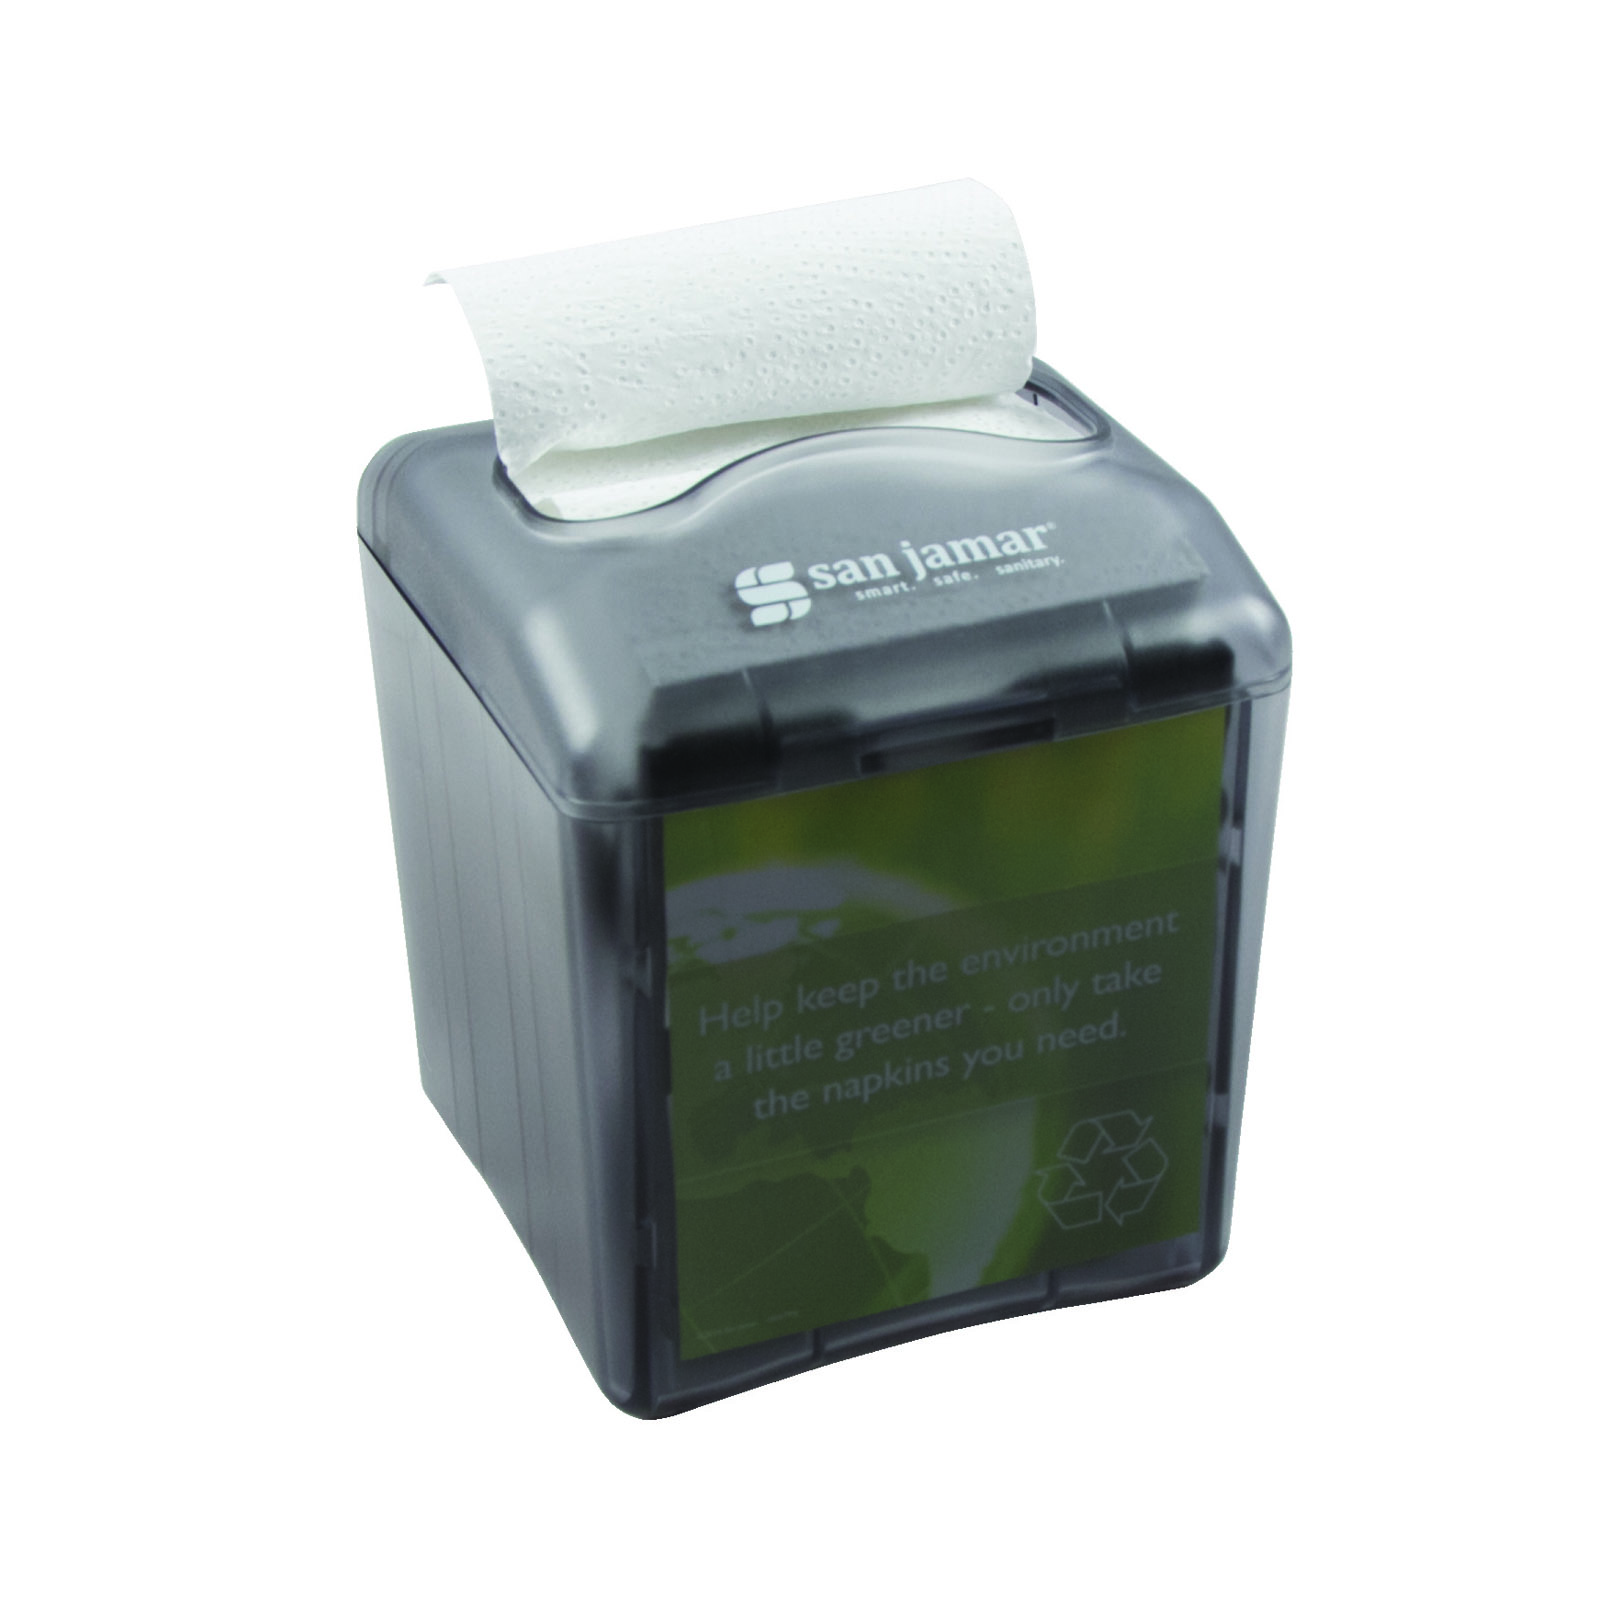 San Jamar H4006TBK paper napkin dispenser